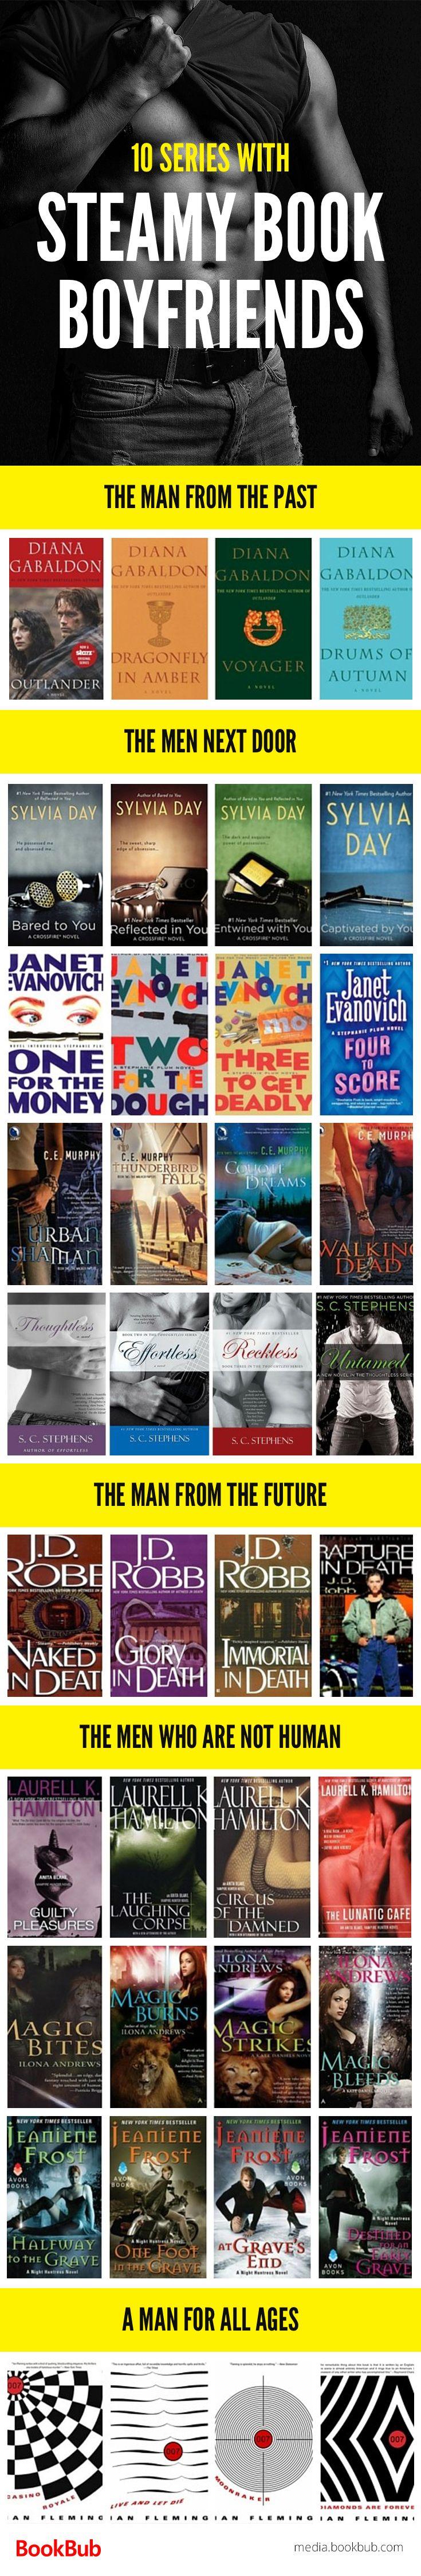 10 Series With Book Boyfriends Who Will Keep You Warm All Winter Book Boyfriends Books Book Club Books